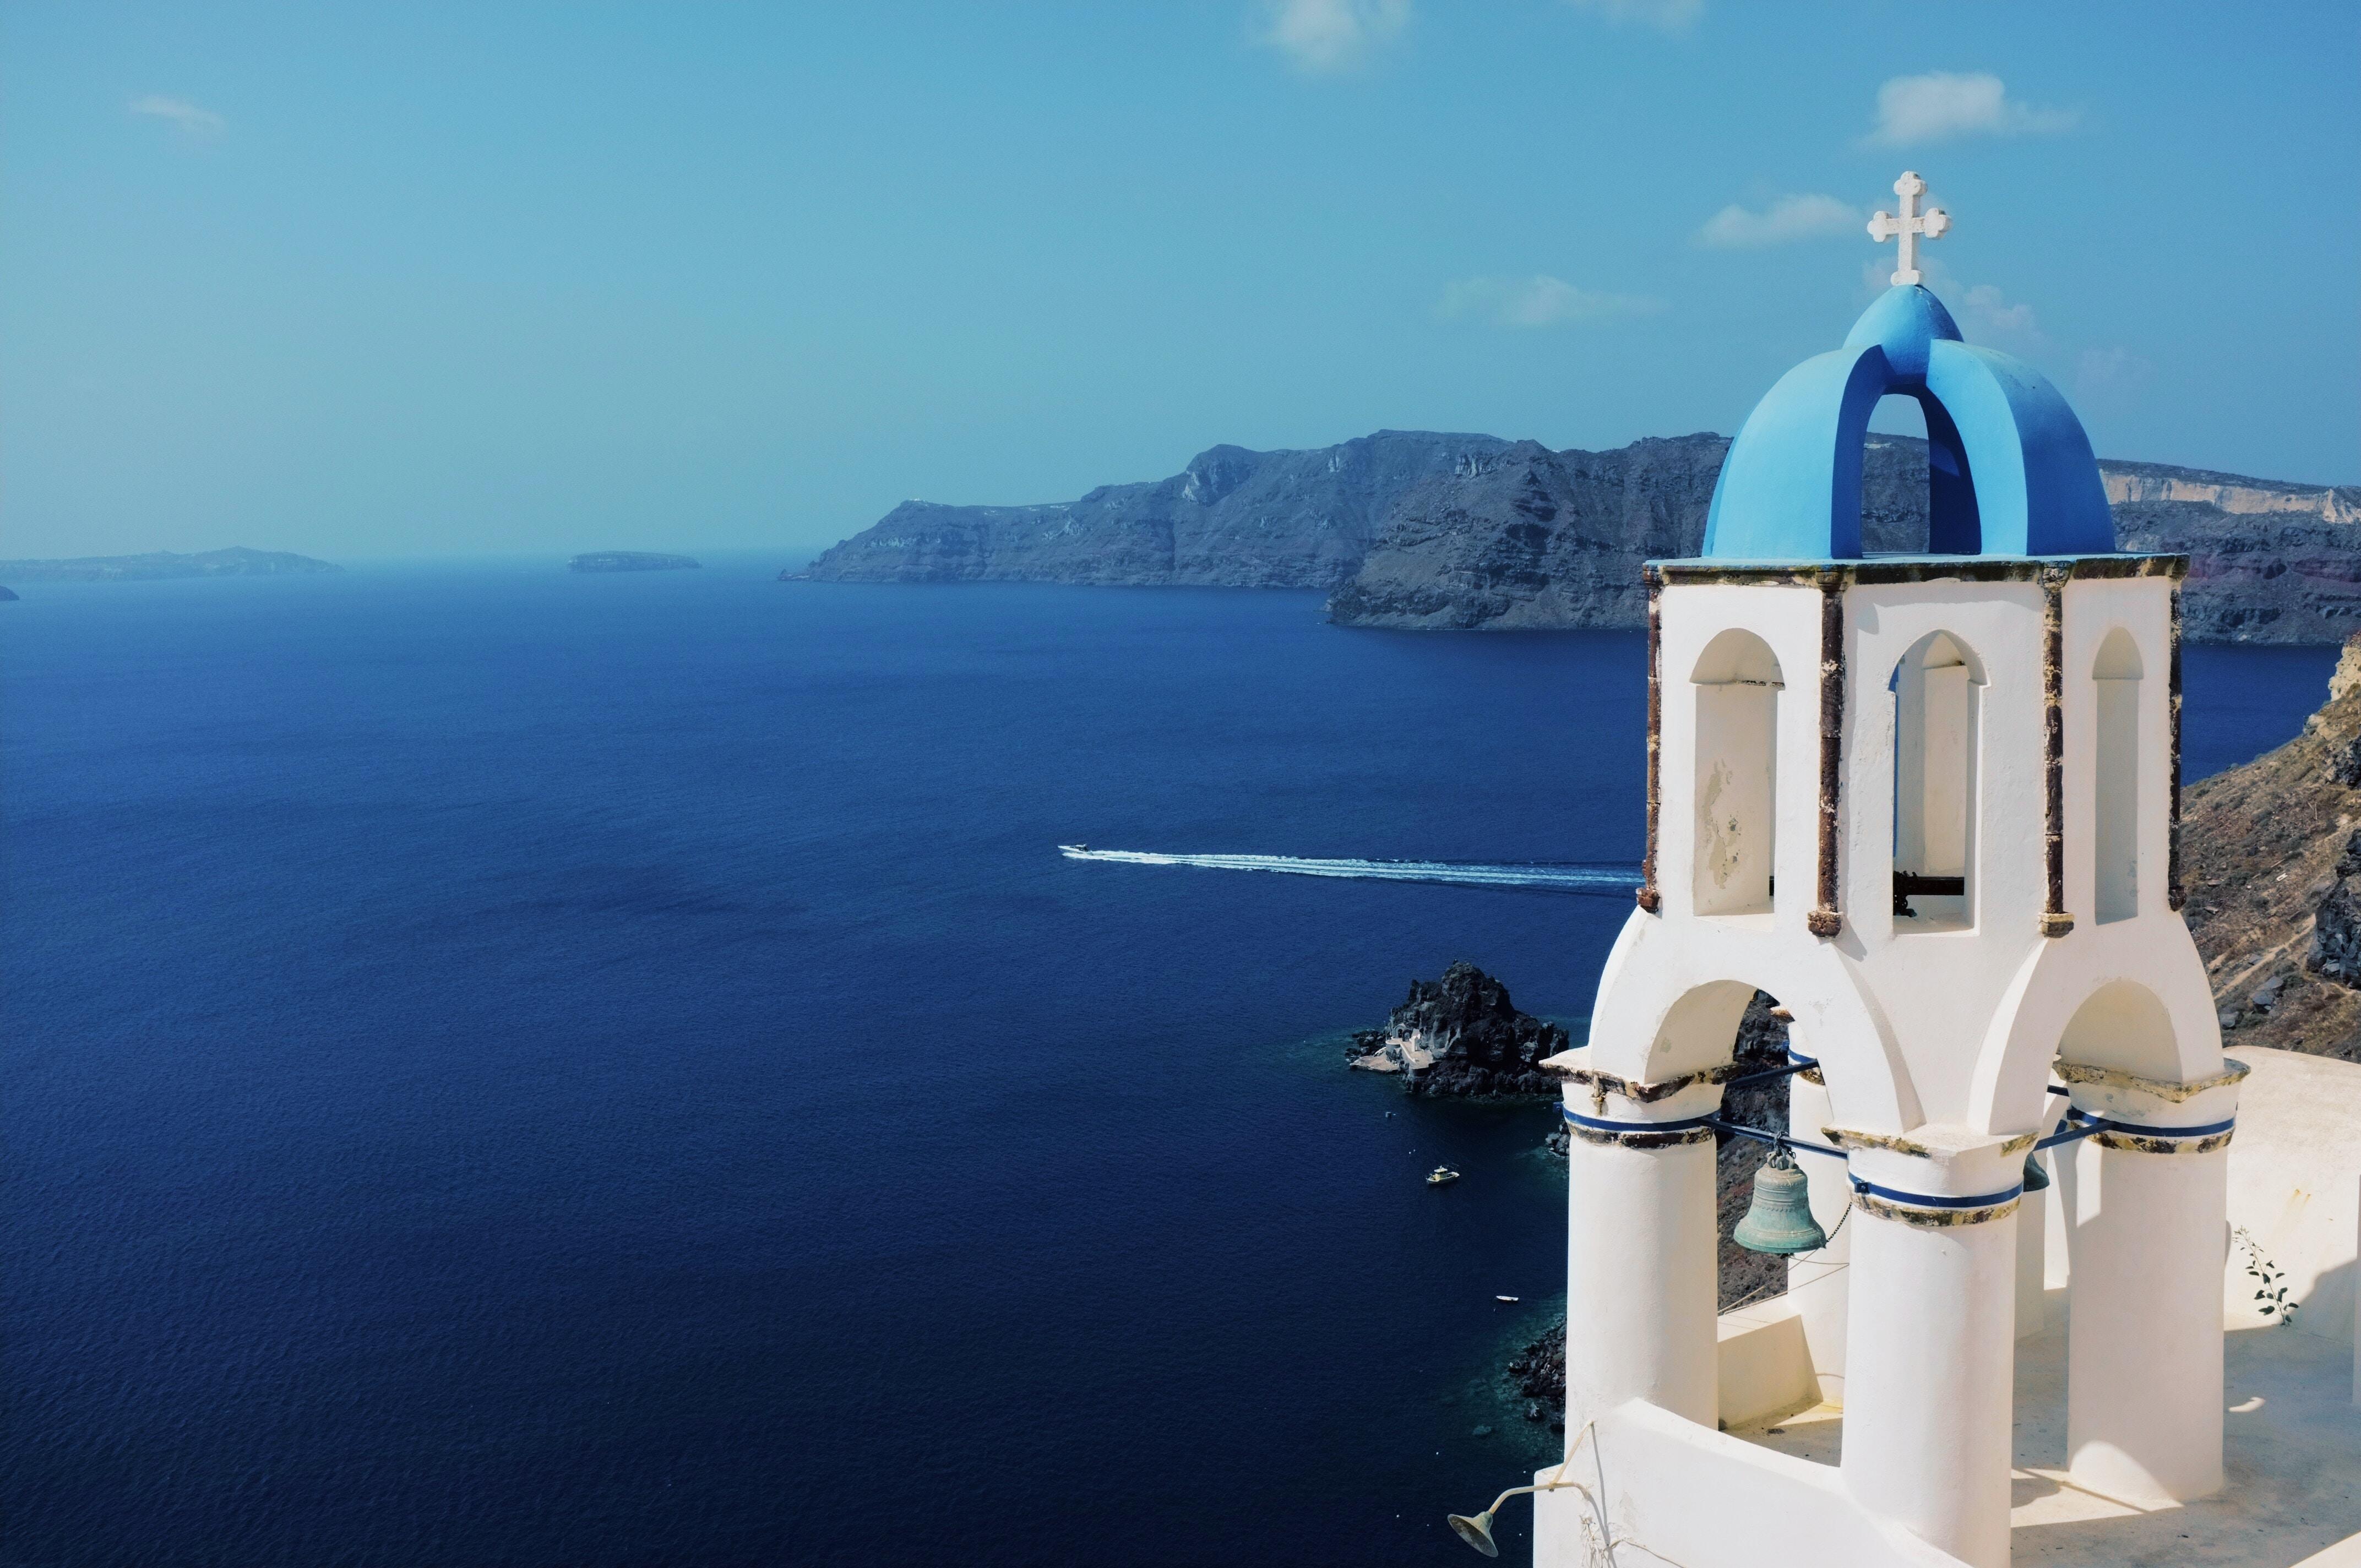 Santorini, Greece during daytime